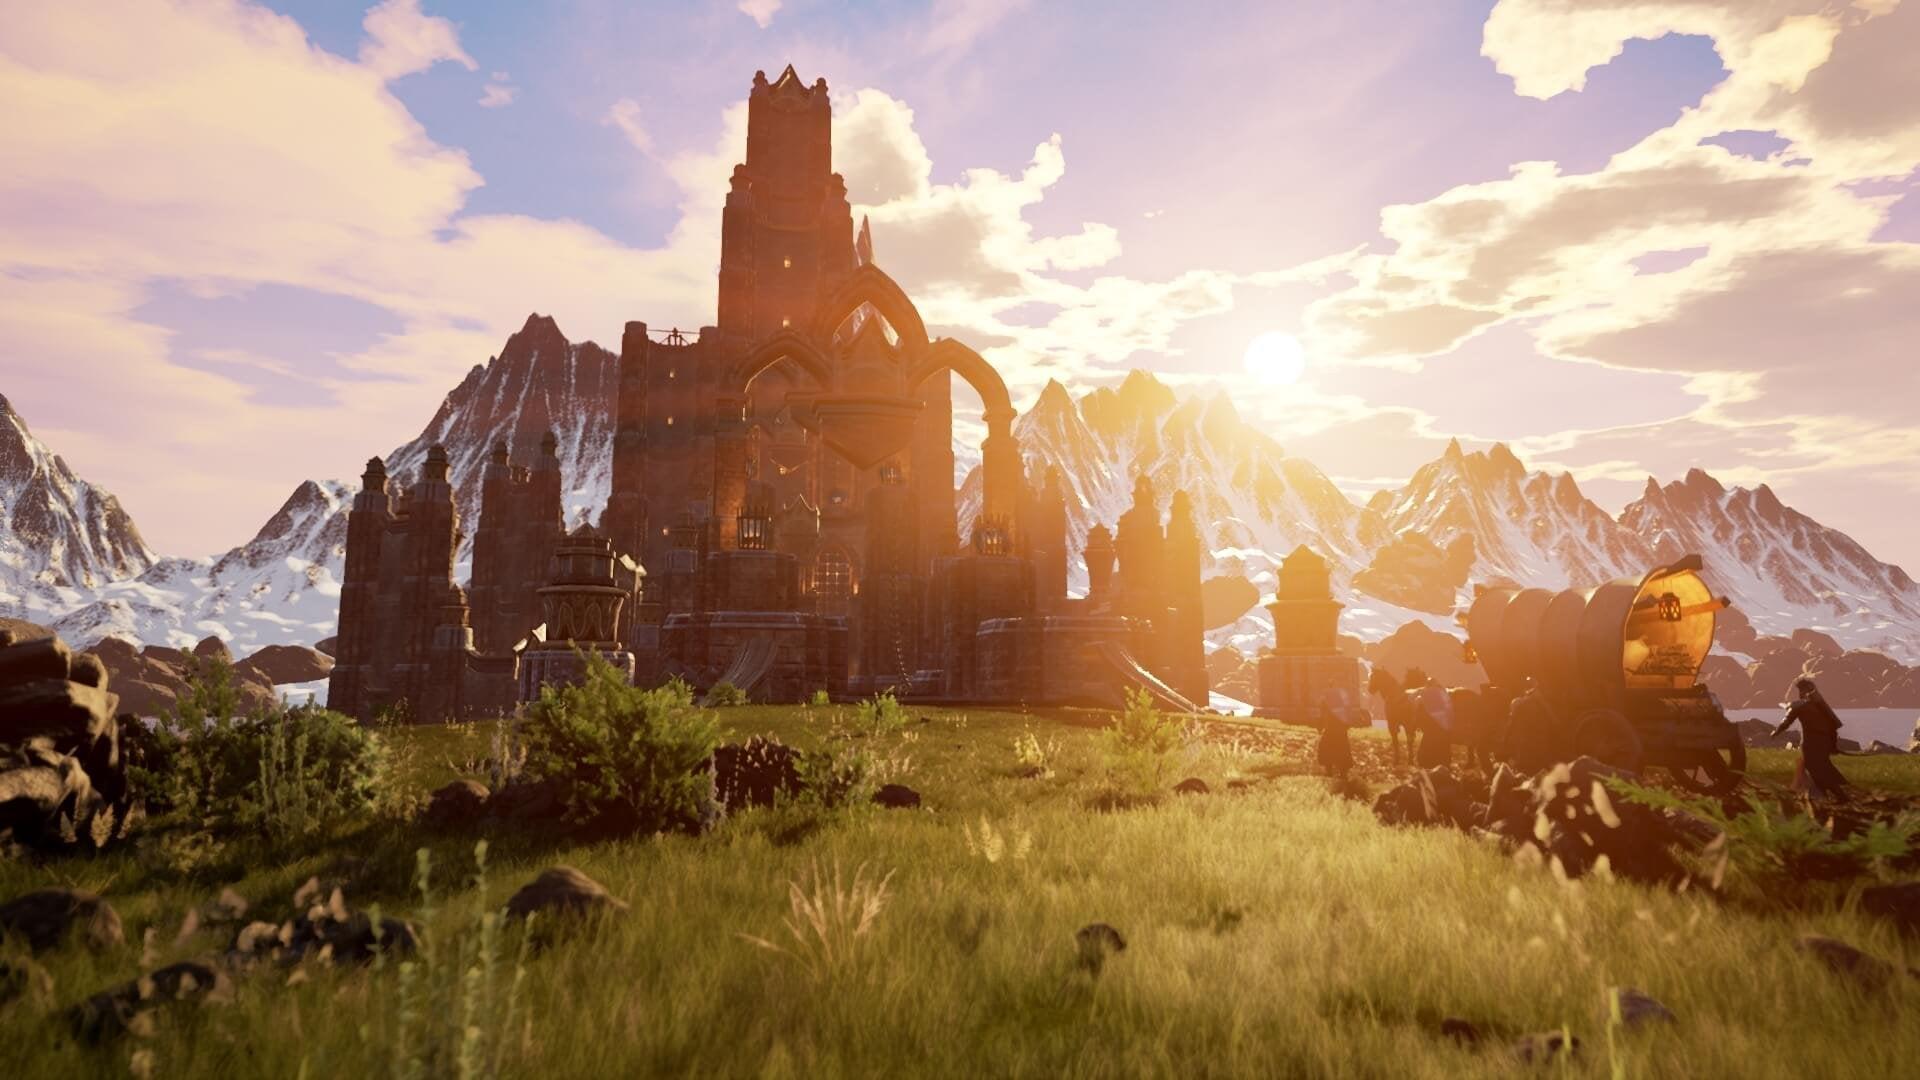 Ashes of Creation Alpha One 2020 Ashes of Creation MMO 2021 Gli MMO più attesi del 2021 e oltre video speciale MMORPG 2021 MMO.it 2021